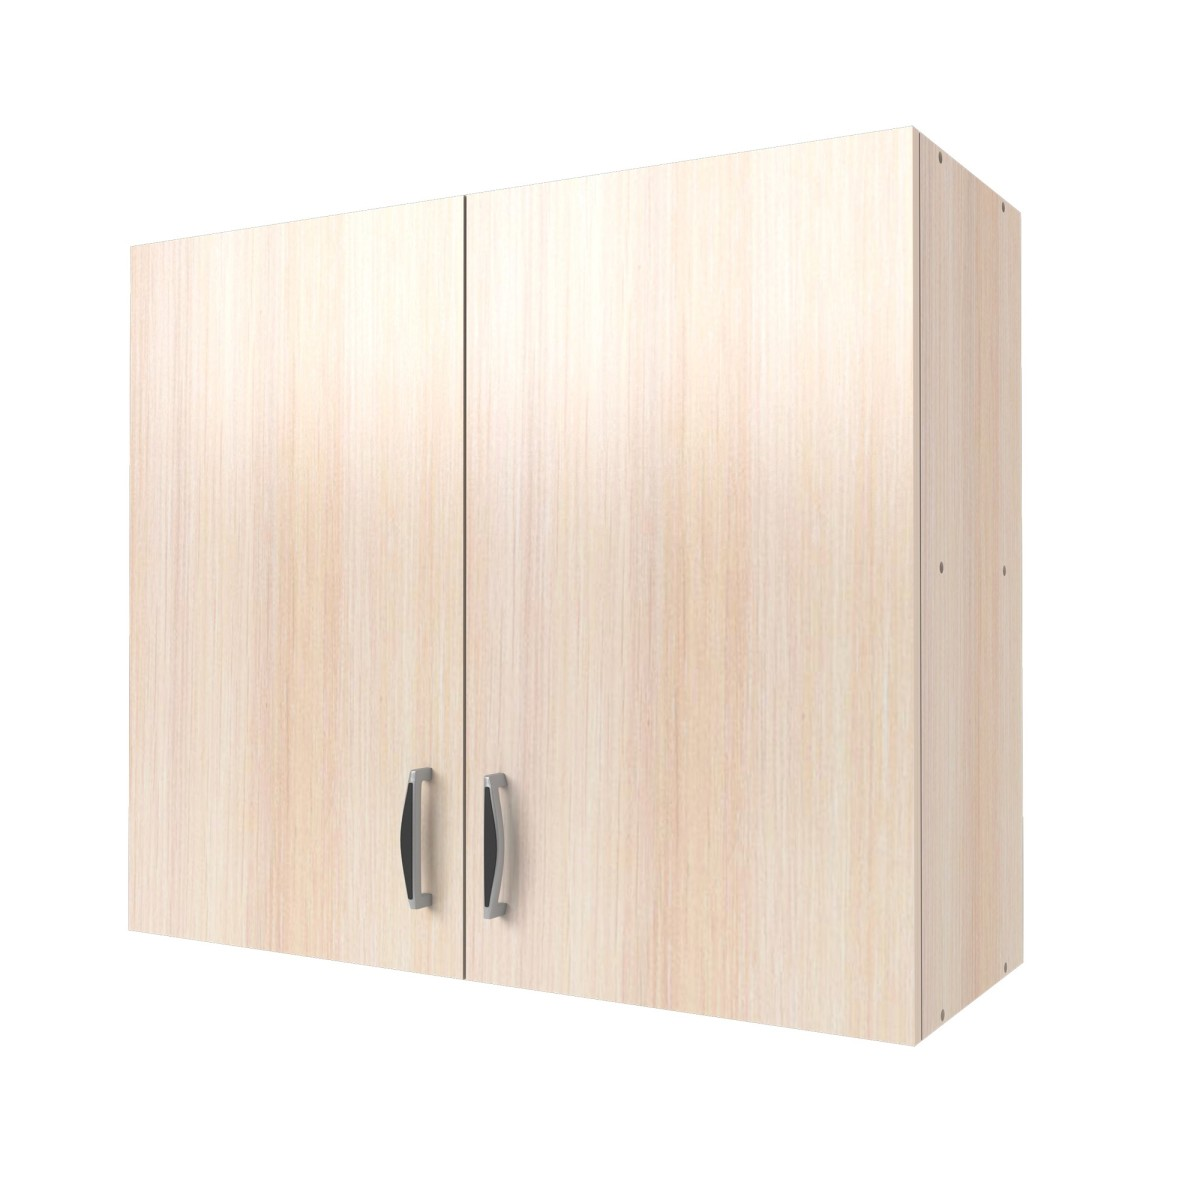 Шкаф навесной Дуб молочный См 68х80 см ЛДСП цвет дуб